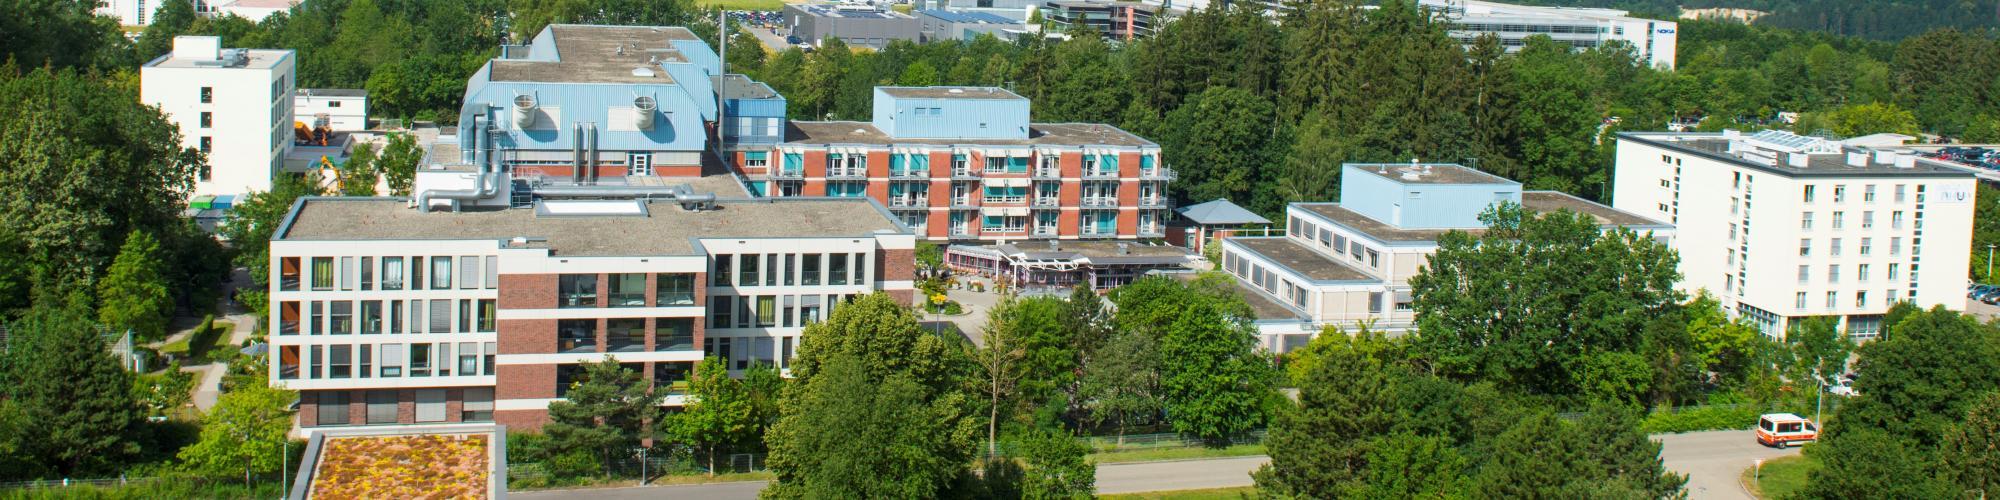 RKU - Universitäts- und Rehabilitationskliniken Ulm gGmbH